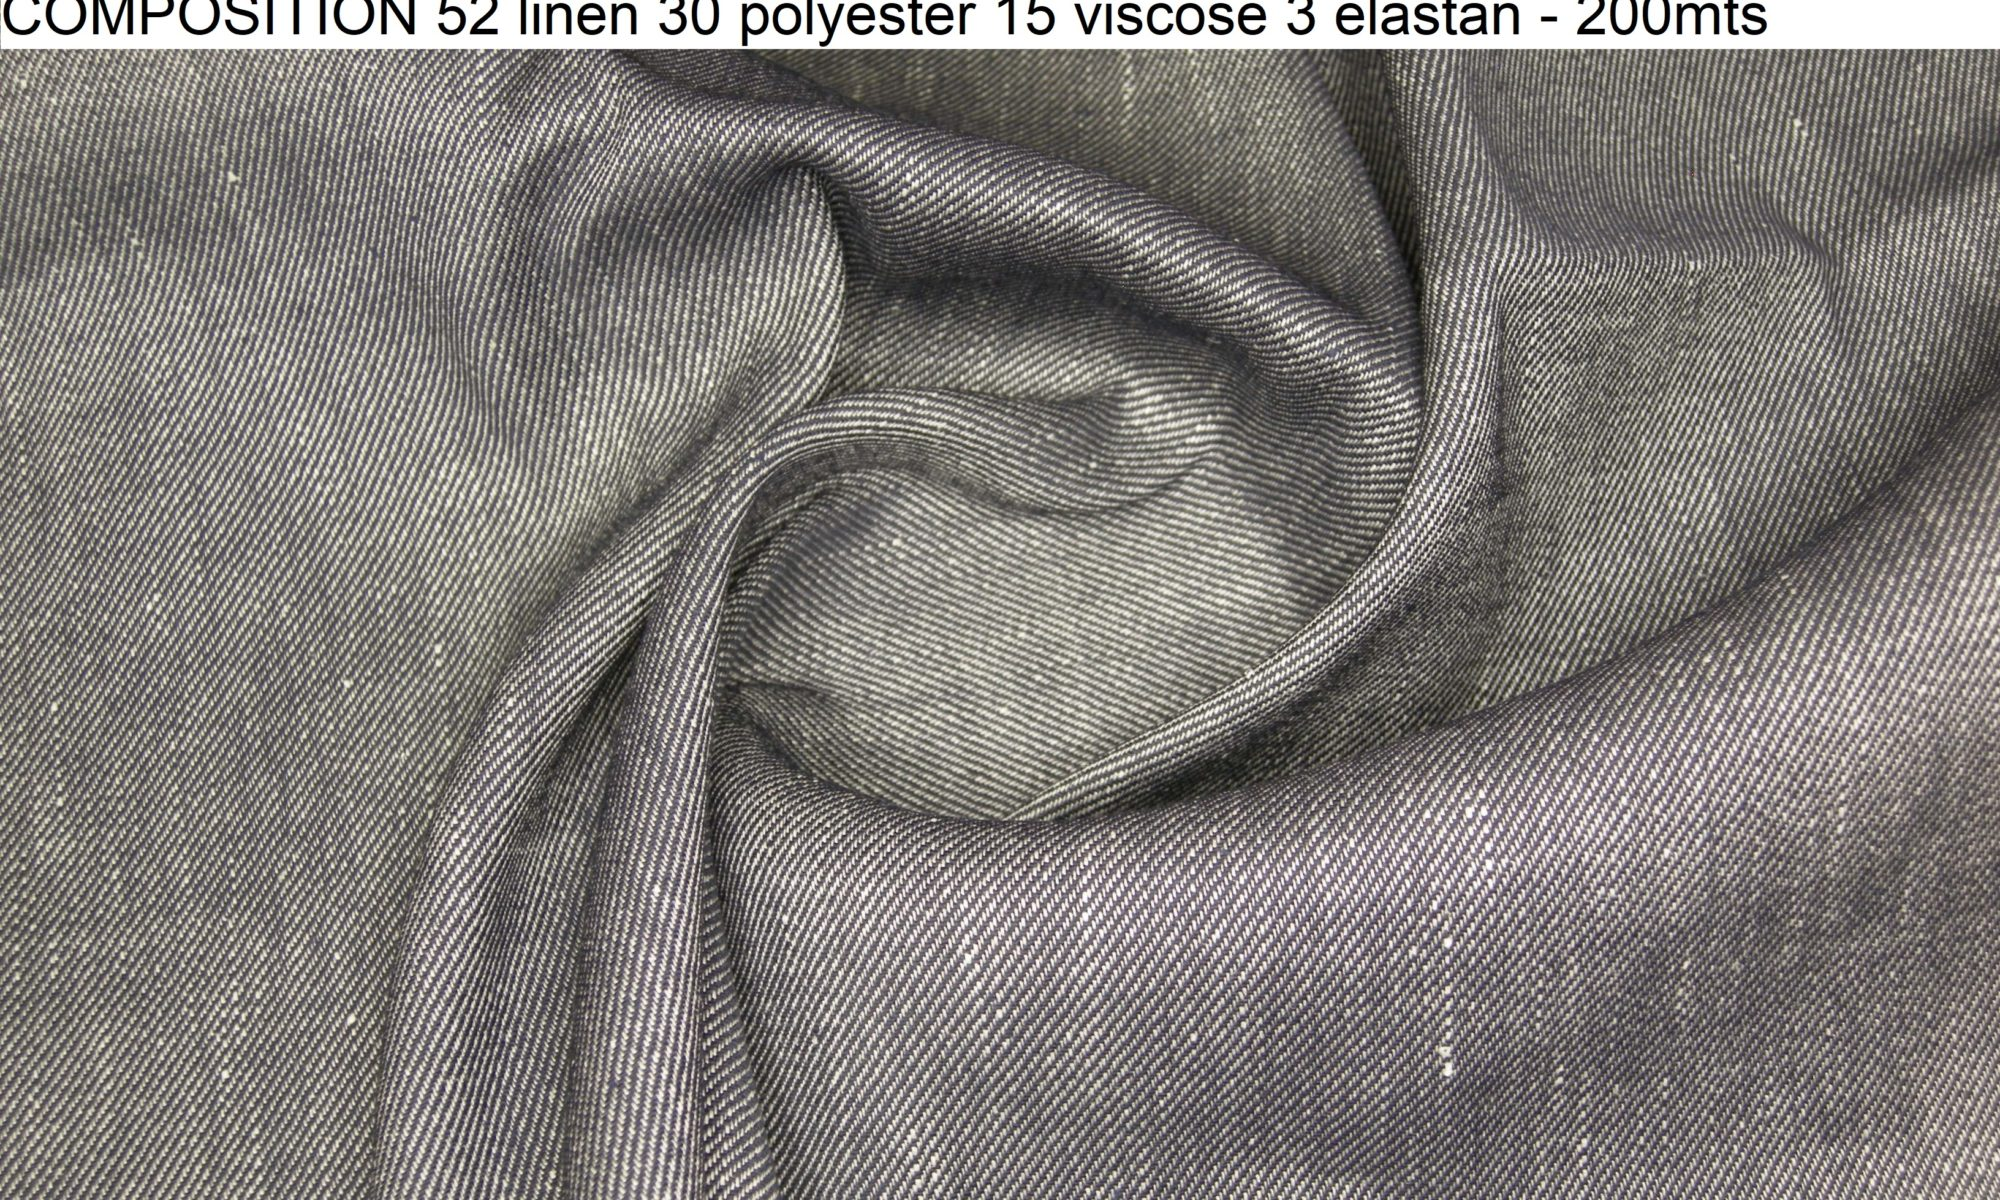 7714 Black and white comfort stretch linen blend twill gabardine jacket pants fabric WIDTH cm127 WEIGHT gr280 - gr220 square meter - COMPOSITION 52 linen 30 polyester 15 viscose 3 elastan - 200mts